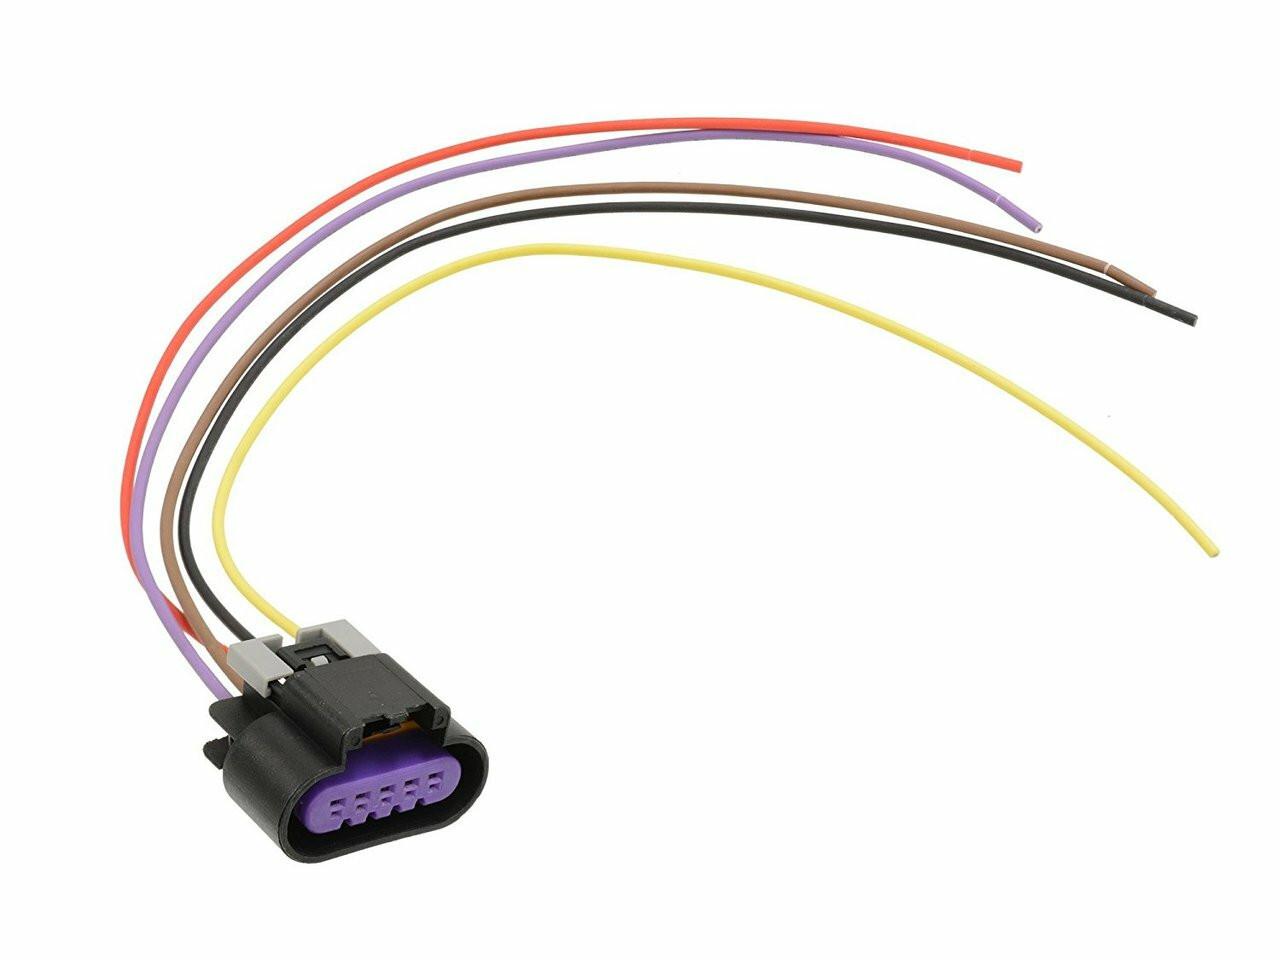 medium resolution of 5 wire maf mass air flow sensor wire harness fits ls3 and ls7 ls3 maf sensor wiring diagram